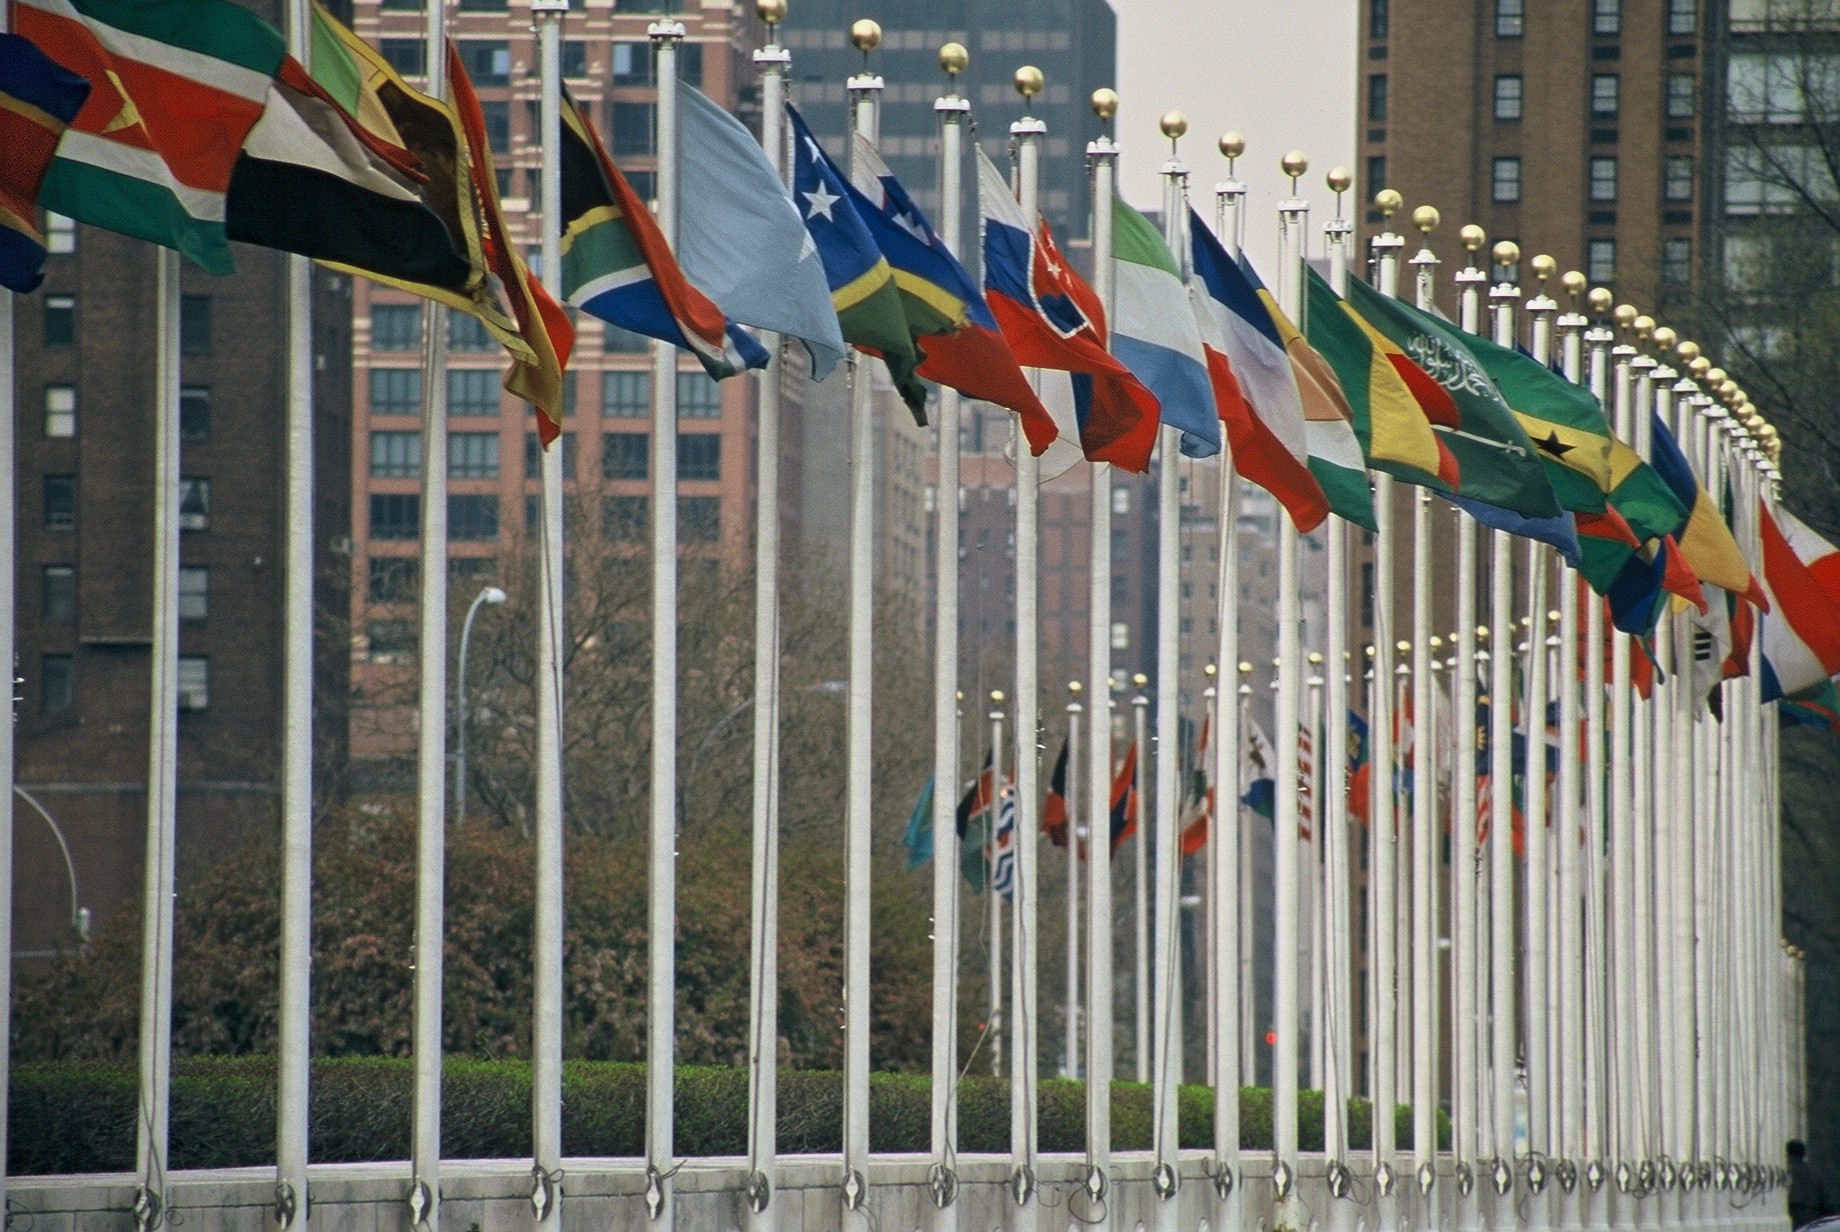 United Nations Members Flags File:UN Members Flags....